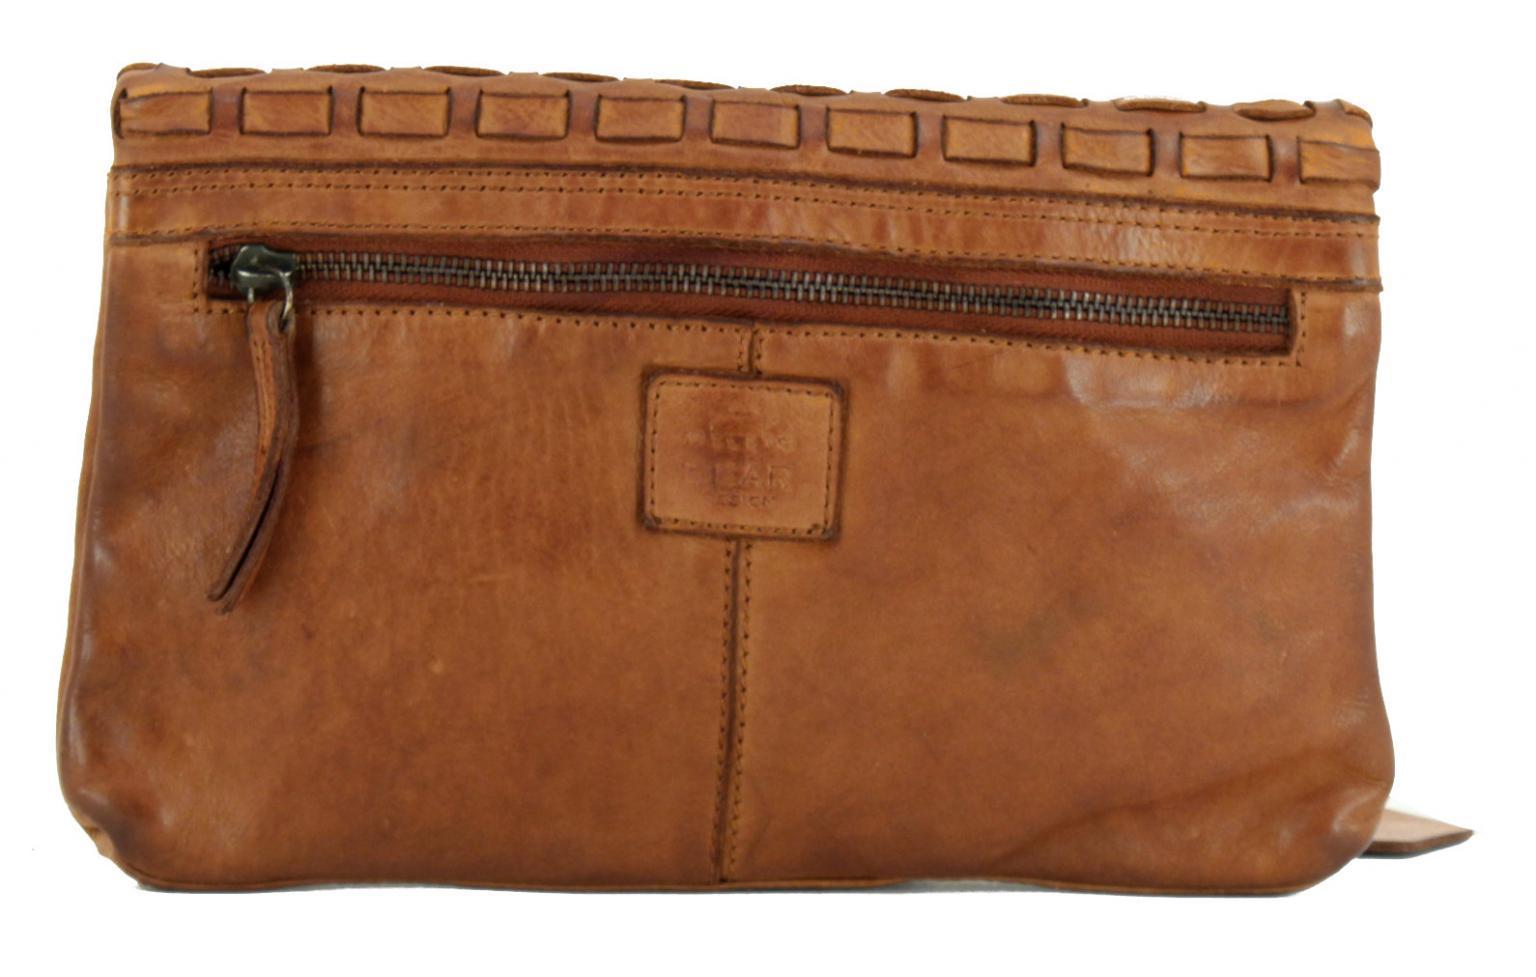 Bear Bags New Woven Cognac Clutch Vintage braun Weboptik